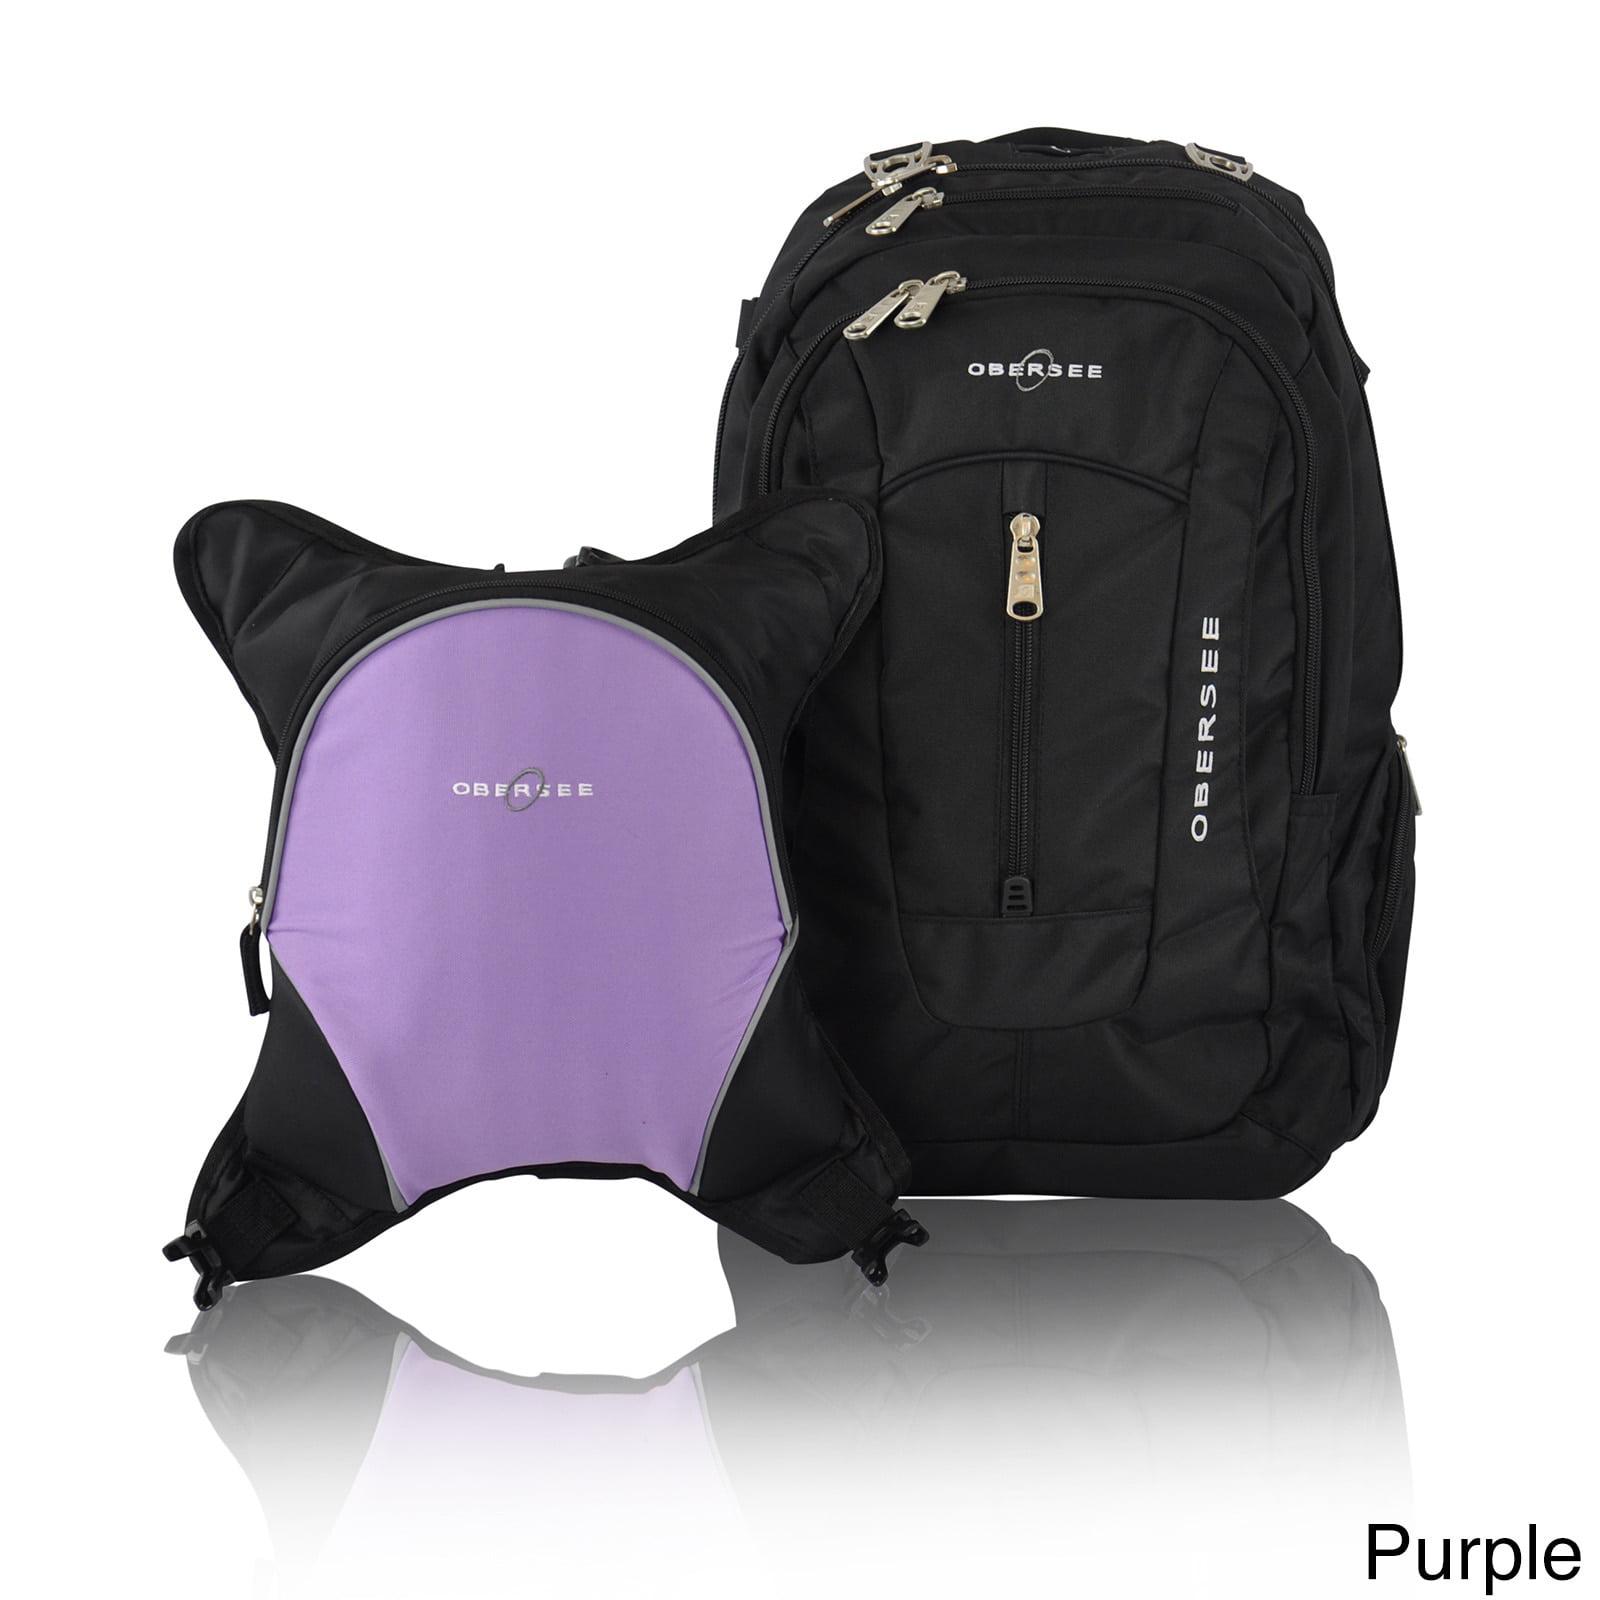 Obersee Bern Diaper Bag Backpack and Cooler, Black/Purple